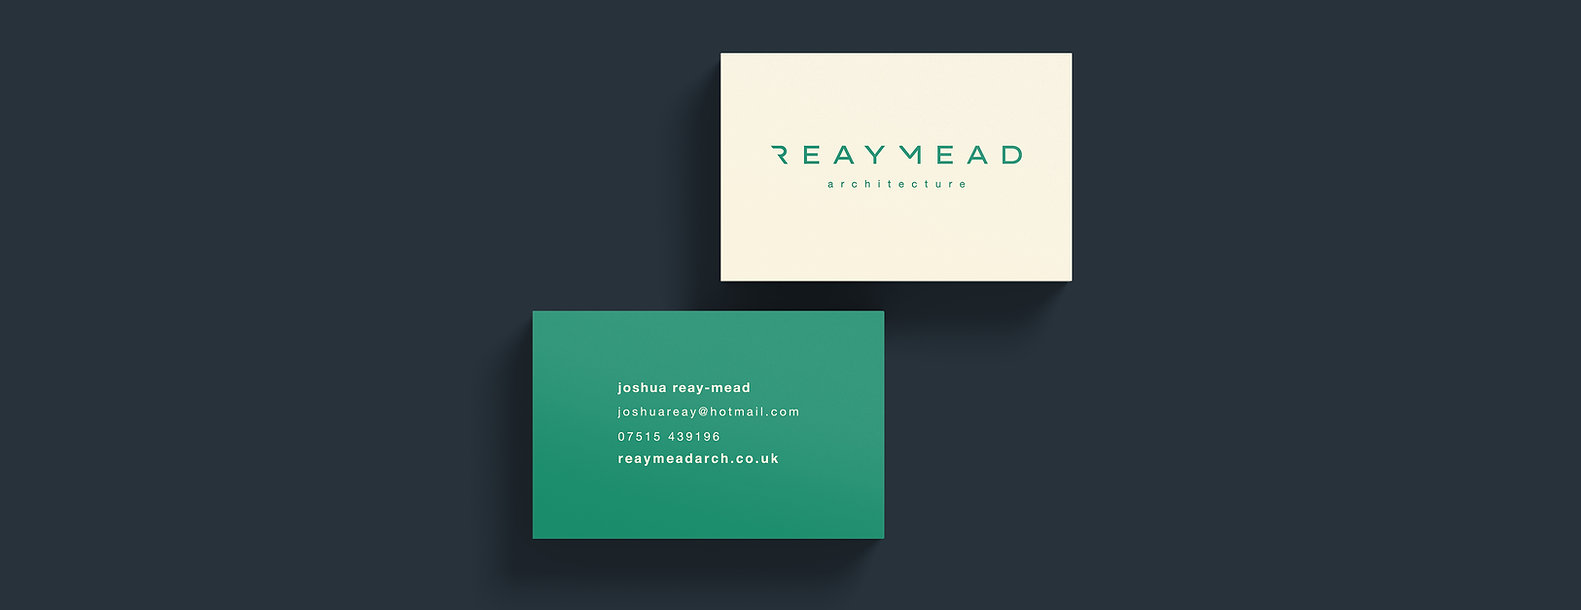 Reay Mead Buisness Card 6.jpg